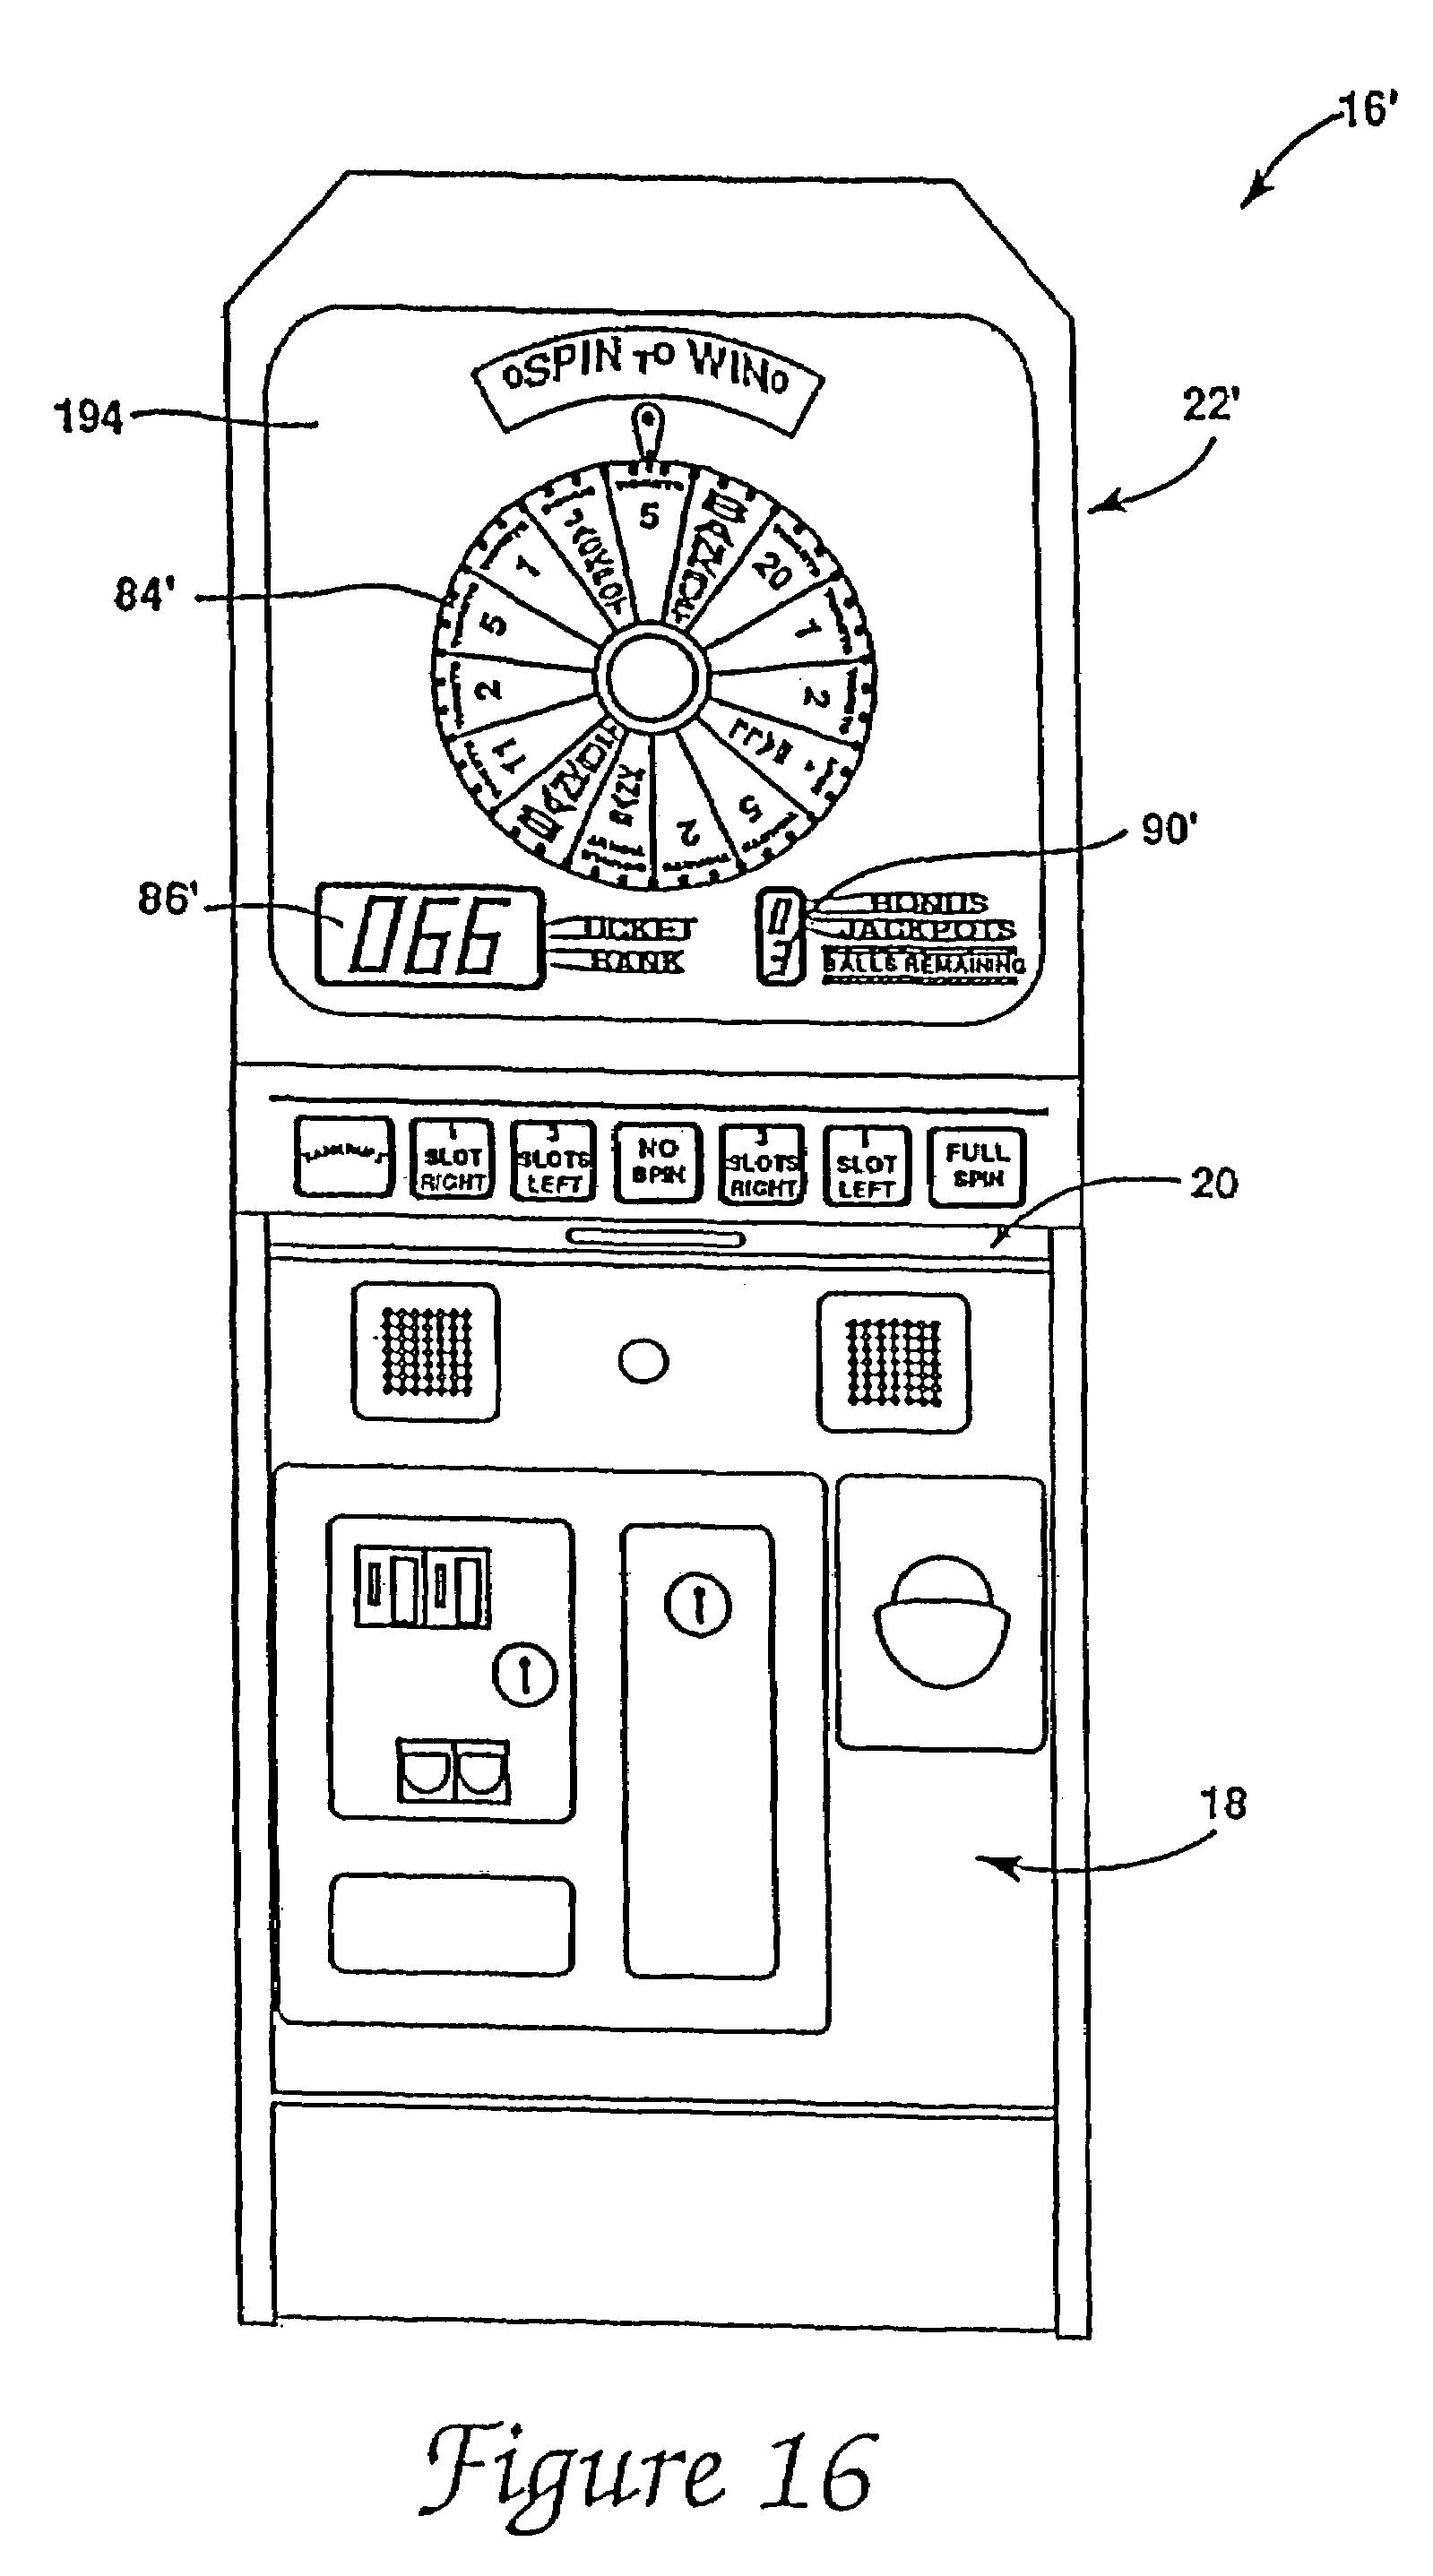 Patente Us7922175 Multi Mode Wheel And Pointer Indicators Google Short Circuit Slot Machine Williams Wms Machines Reel Gambling Patent Drawing